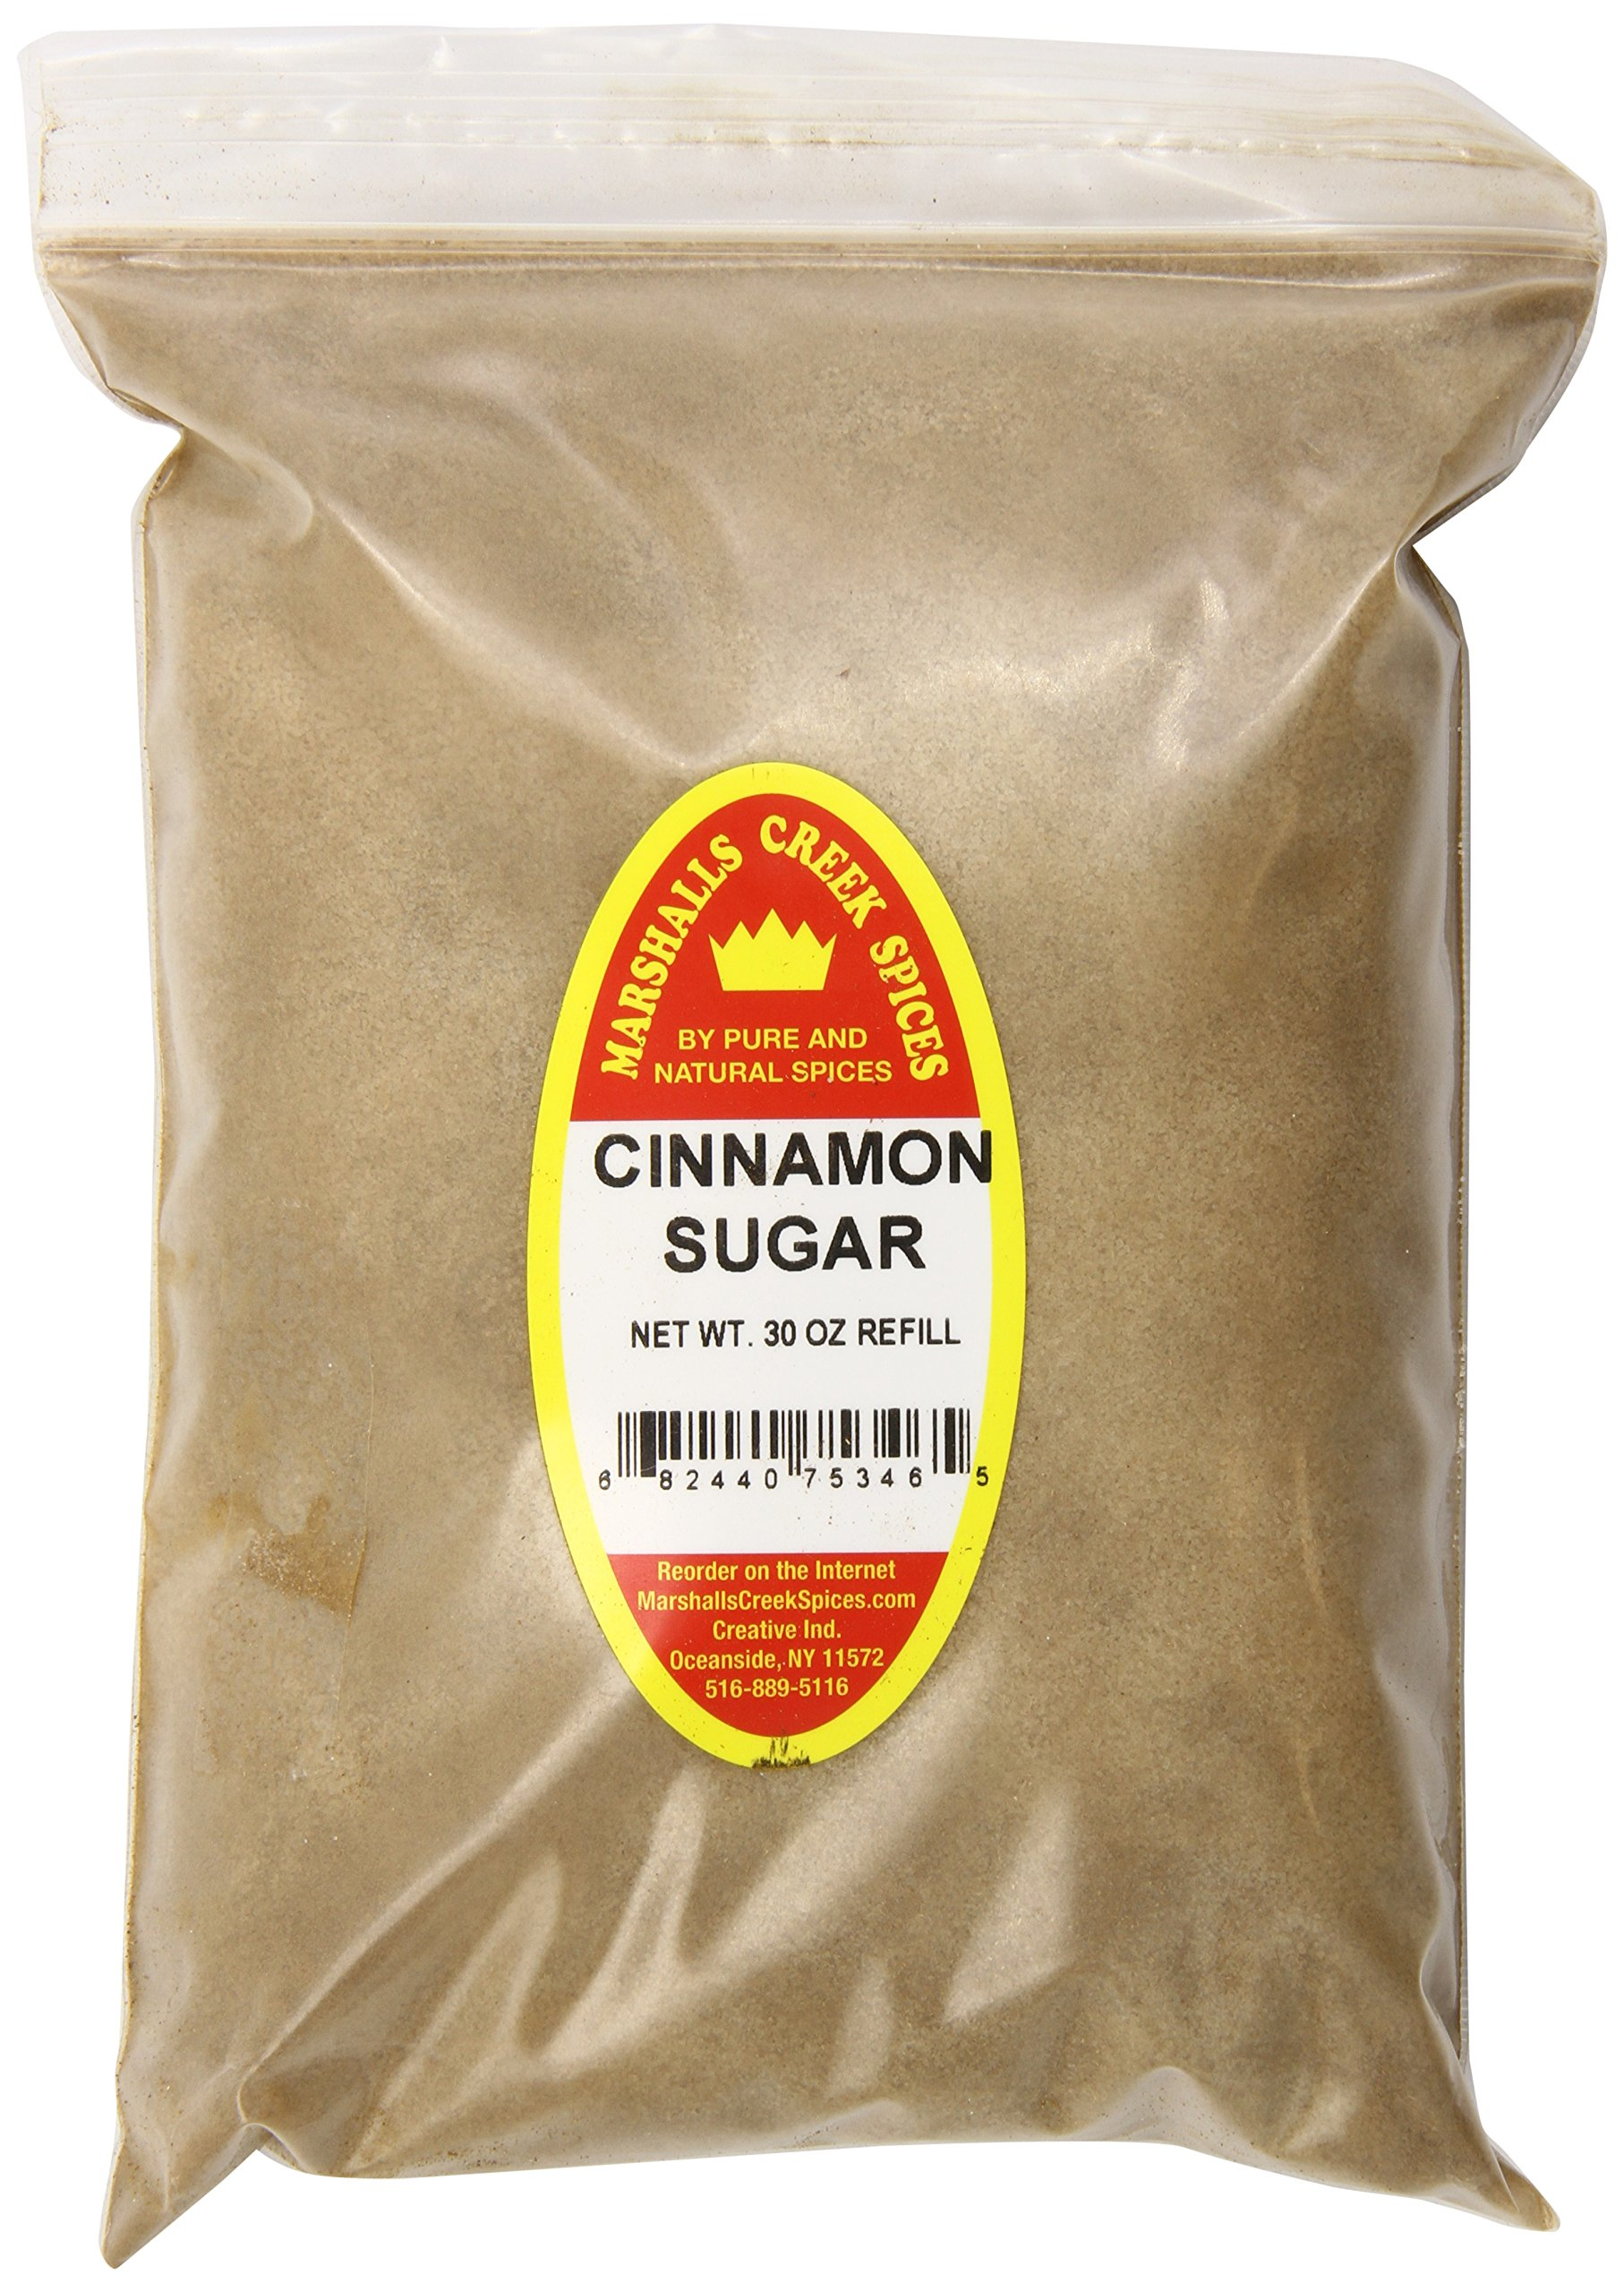 Marshalls Creek Spices X-Large Refill Cinnamon Sugar, 30 Ounce